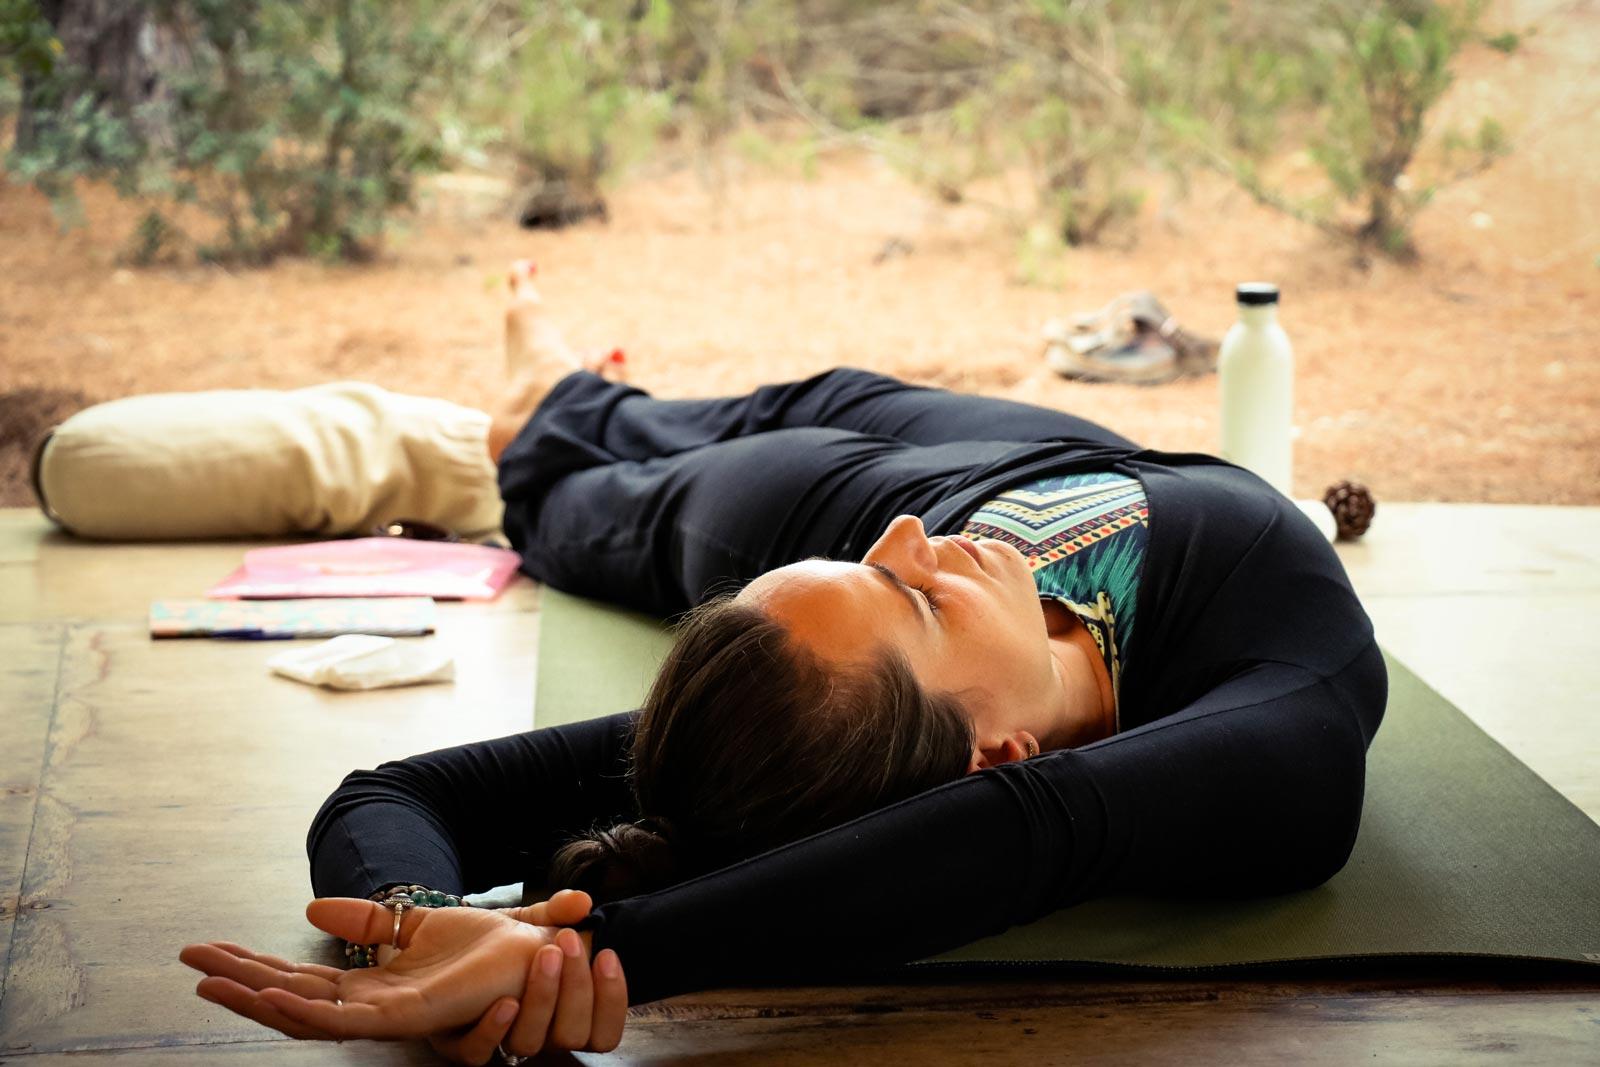 Saskia_Schreiber_Yin_Yoga_Vertiefung_2019_IMG_9686-2.jpg